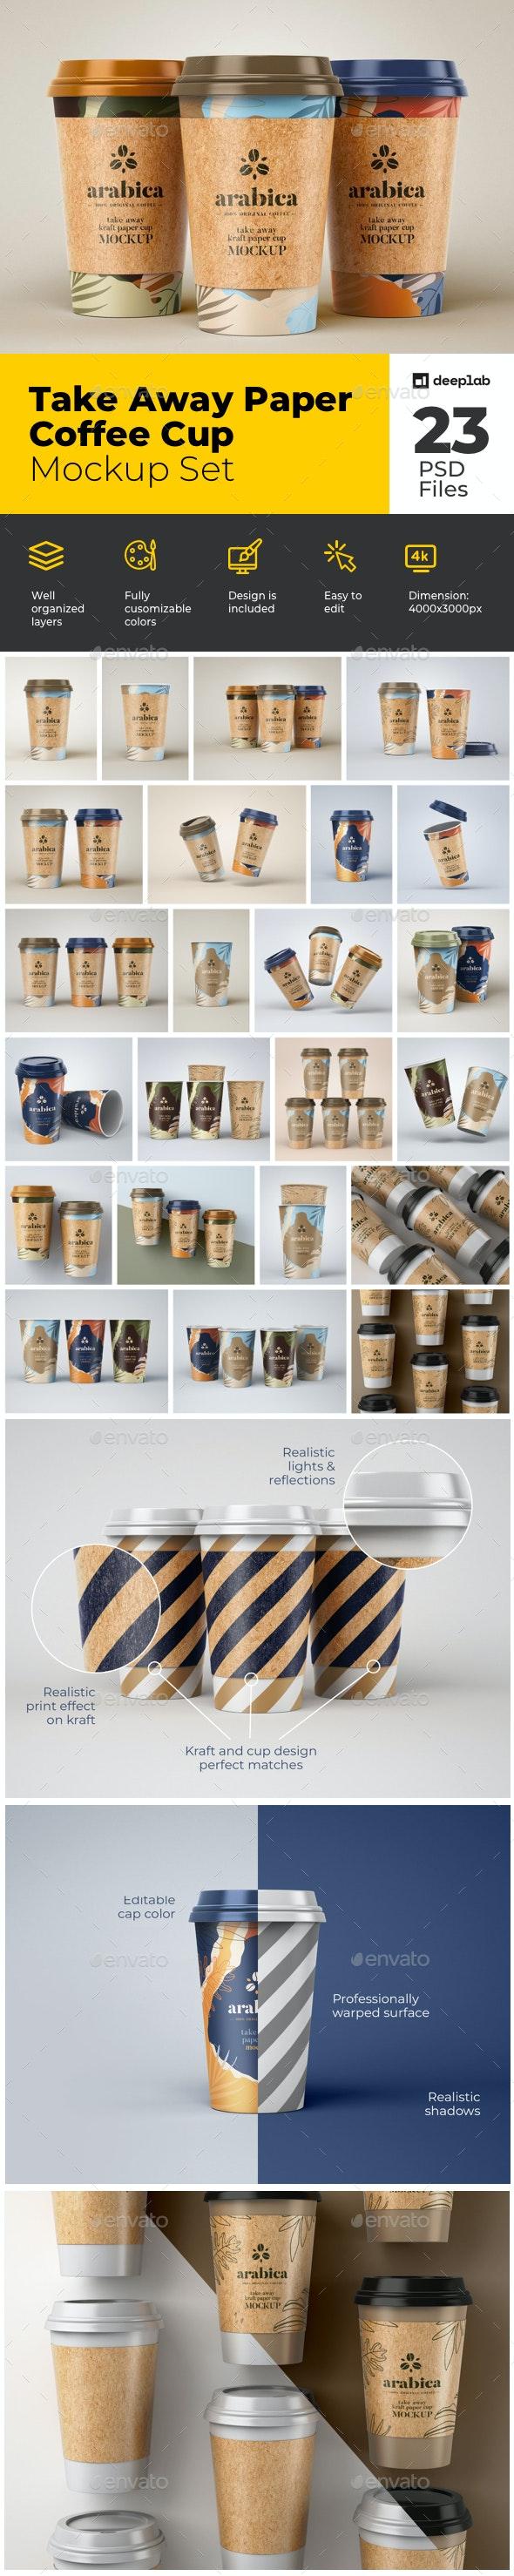 Take Away Paper Coffee Cup Mockup Set - Product Mock-Ups Graphics